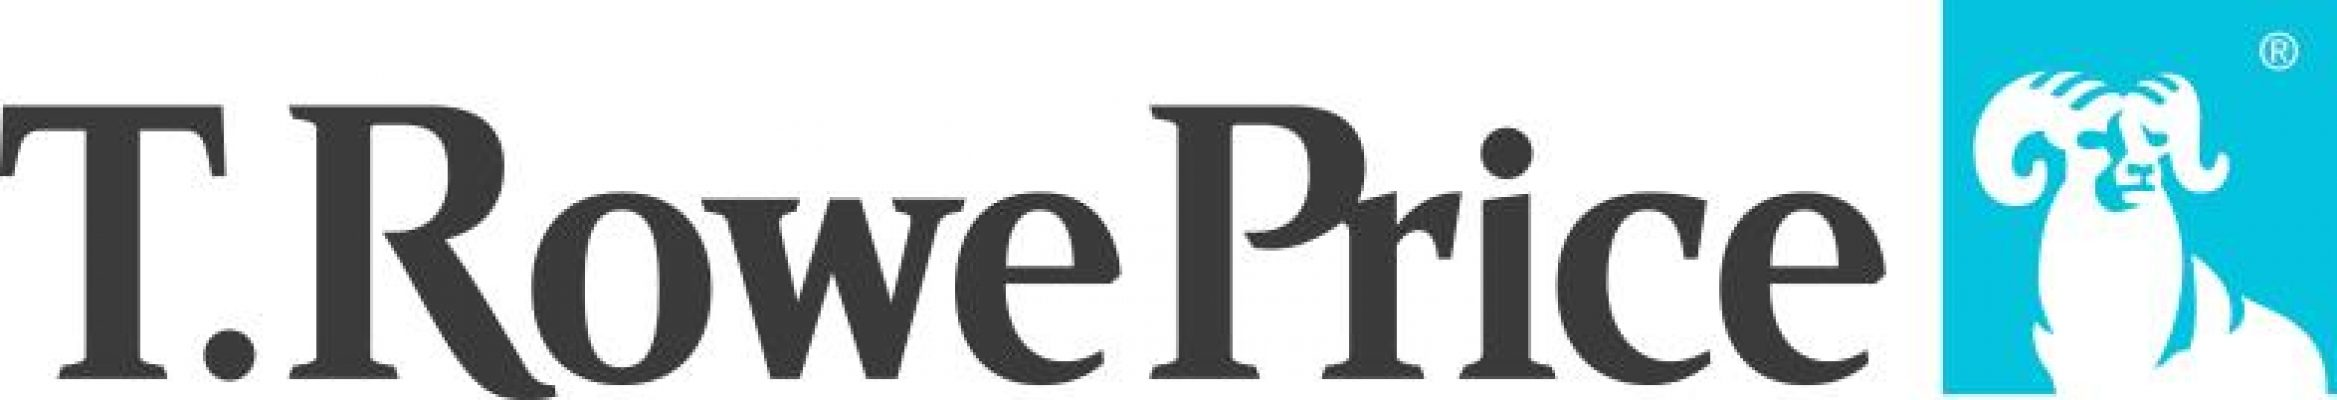 TRP_Co-BrandingColor_R